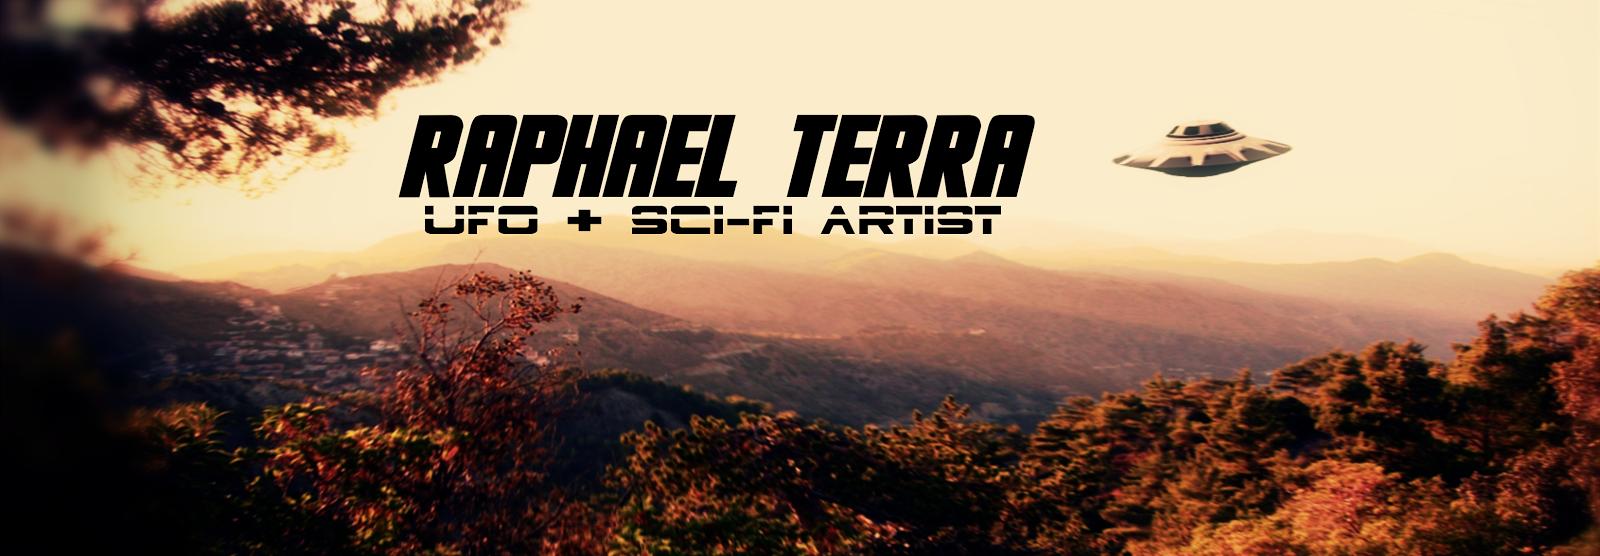 Raphael Terra UFO Art